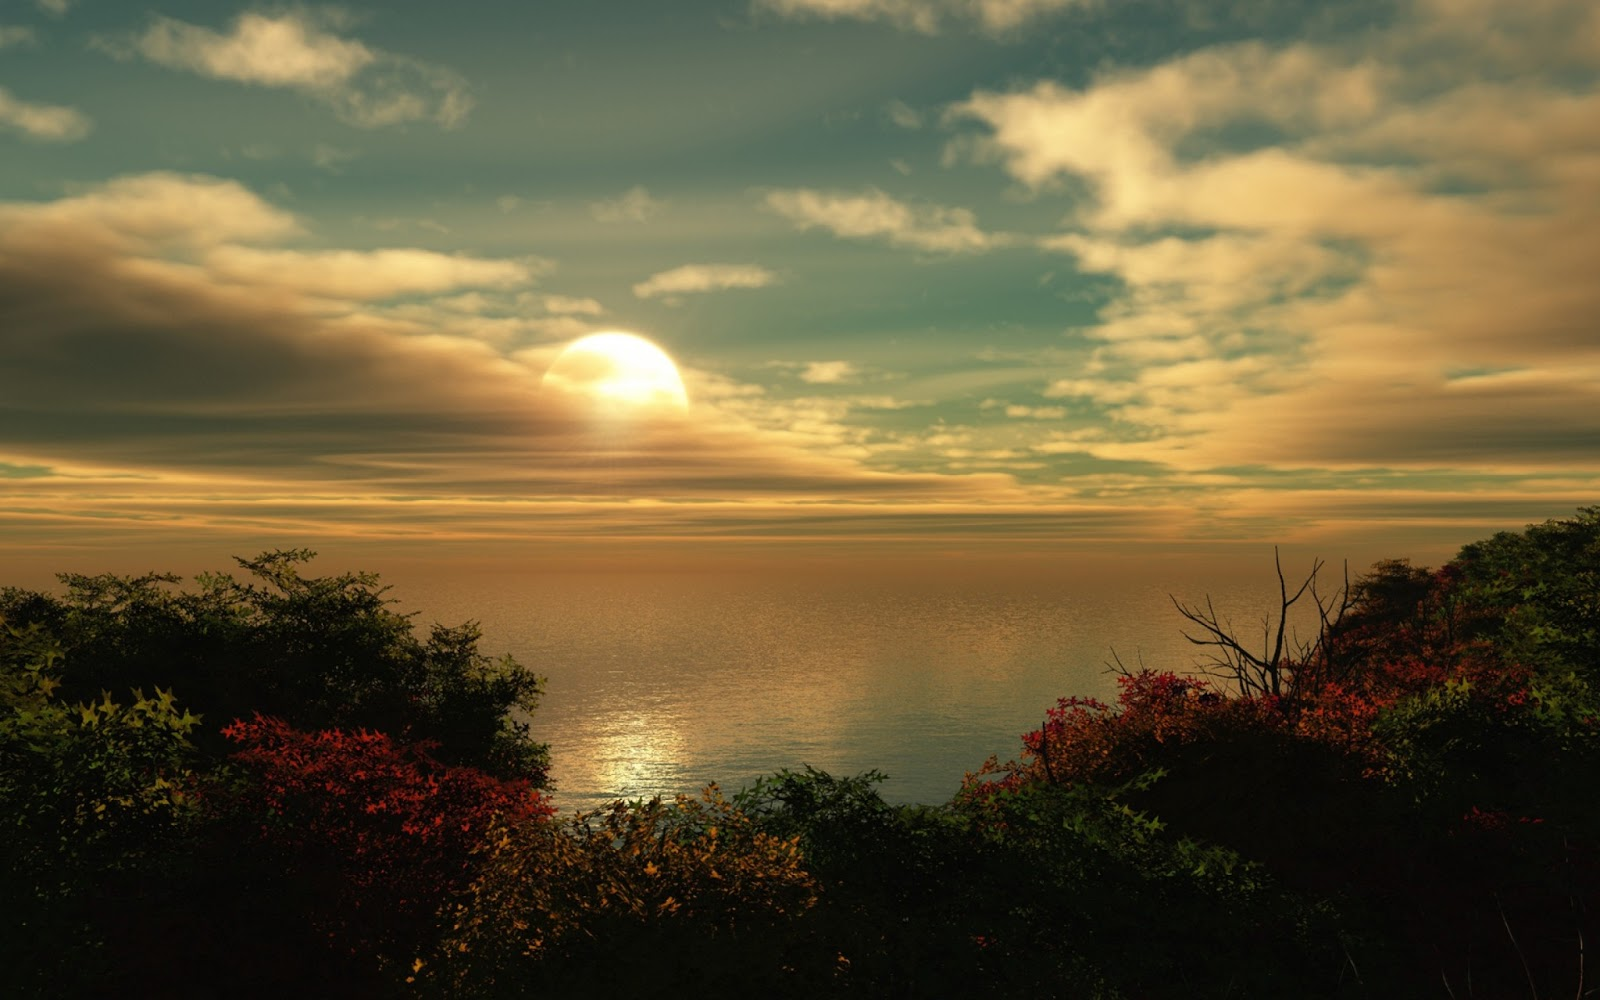 Beautiful Nature Wallpapers Hd: BEAUTIFUL NATURE HD WALLPAPERS 1080p